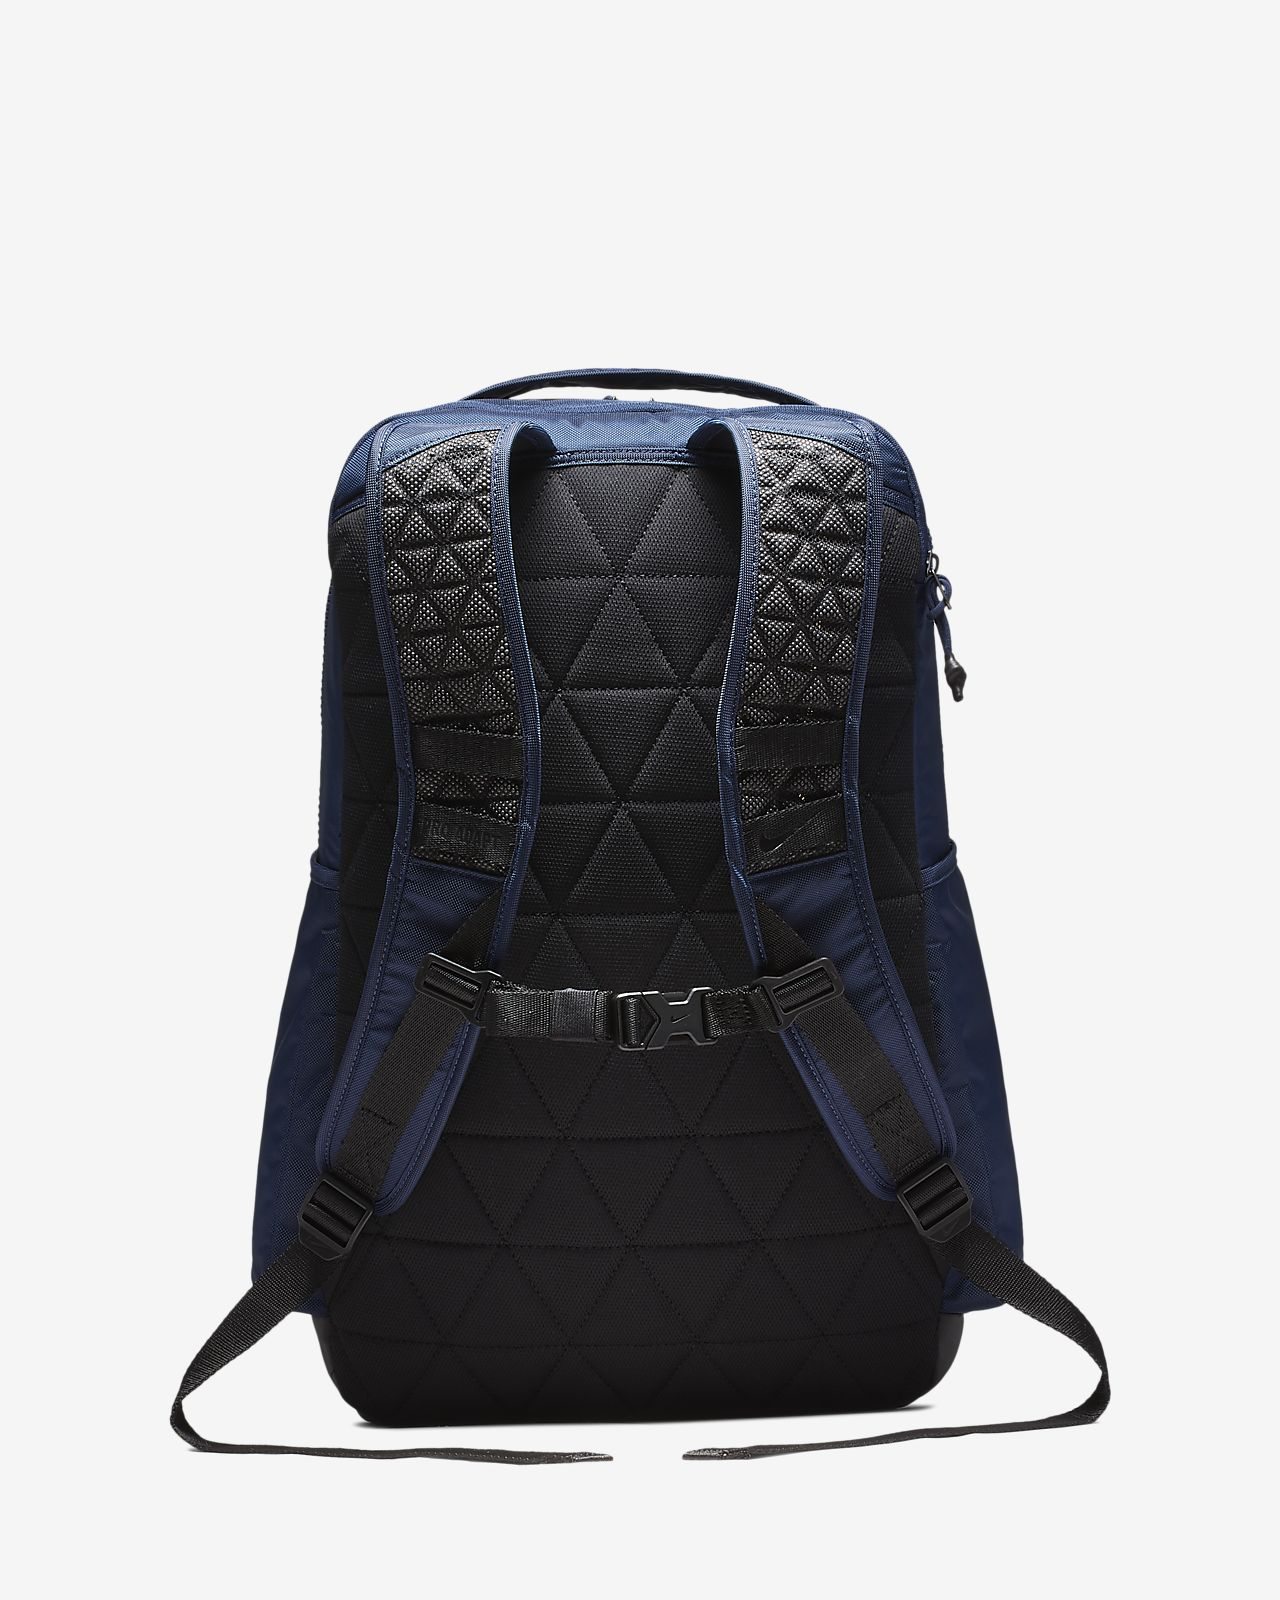 12bbf5372d3d75 Nike Vapor Power 2.0 Training Backpack. Nike.com BE